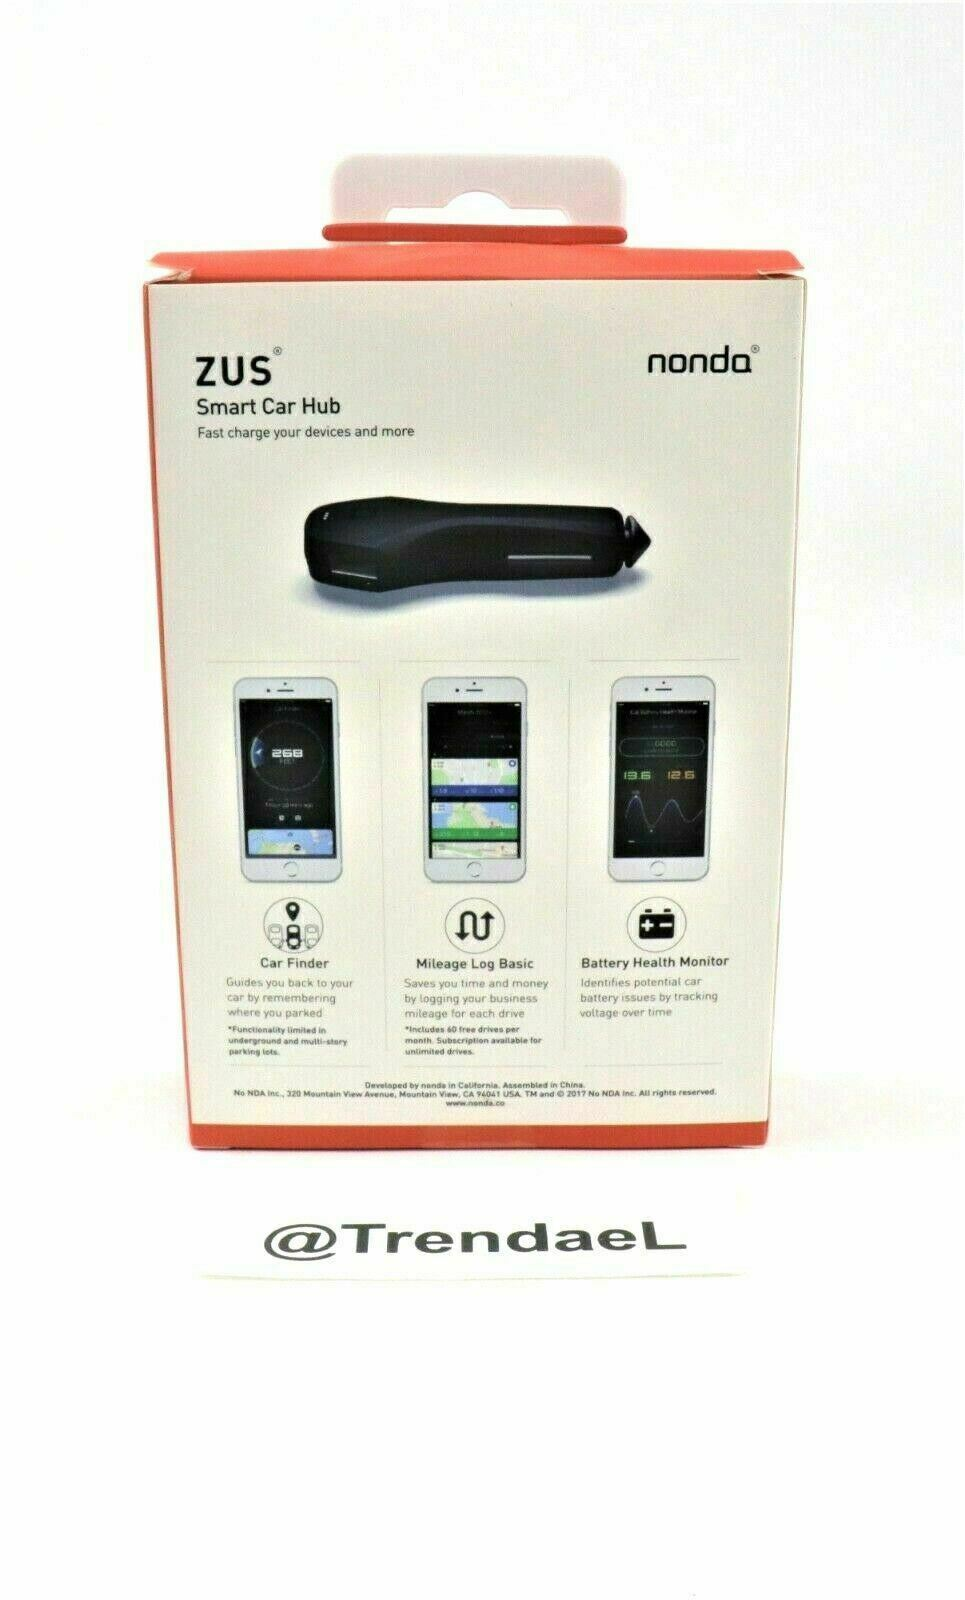 New ZUS Smart Car Hub USB Charger Battery Monitor Car Locator Mileage Log Nonda